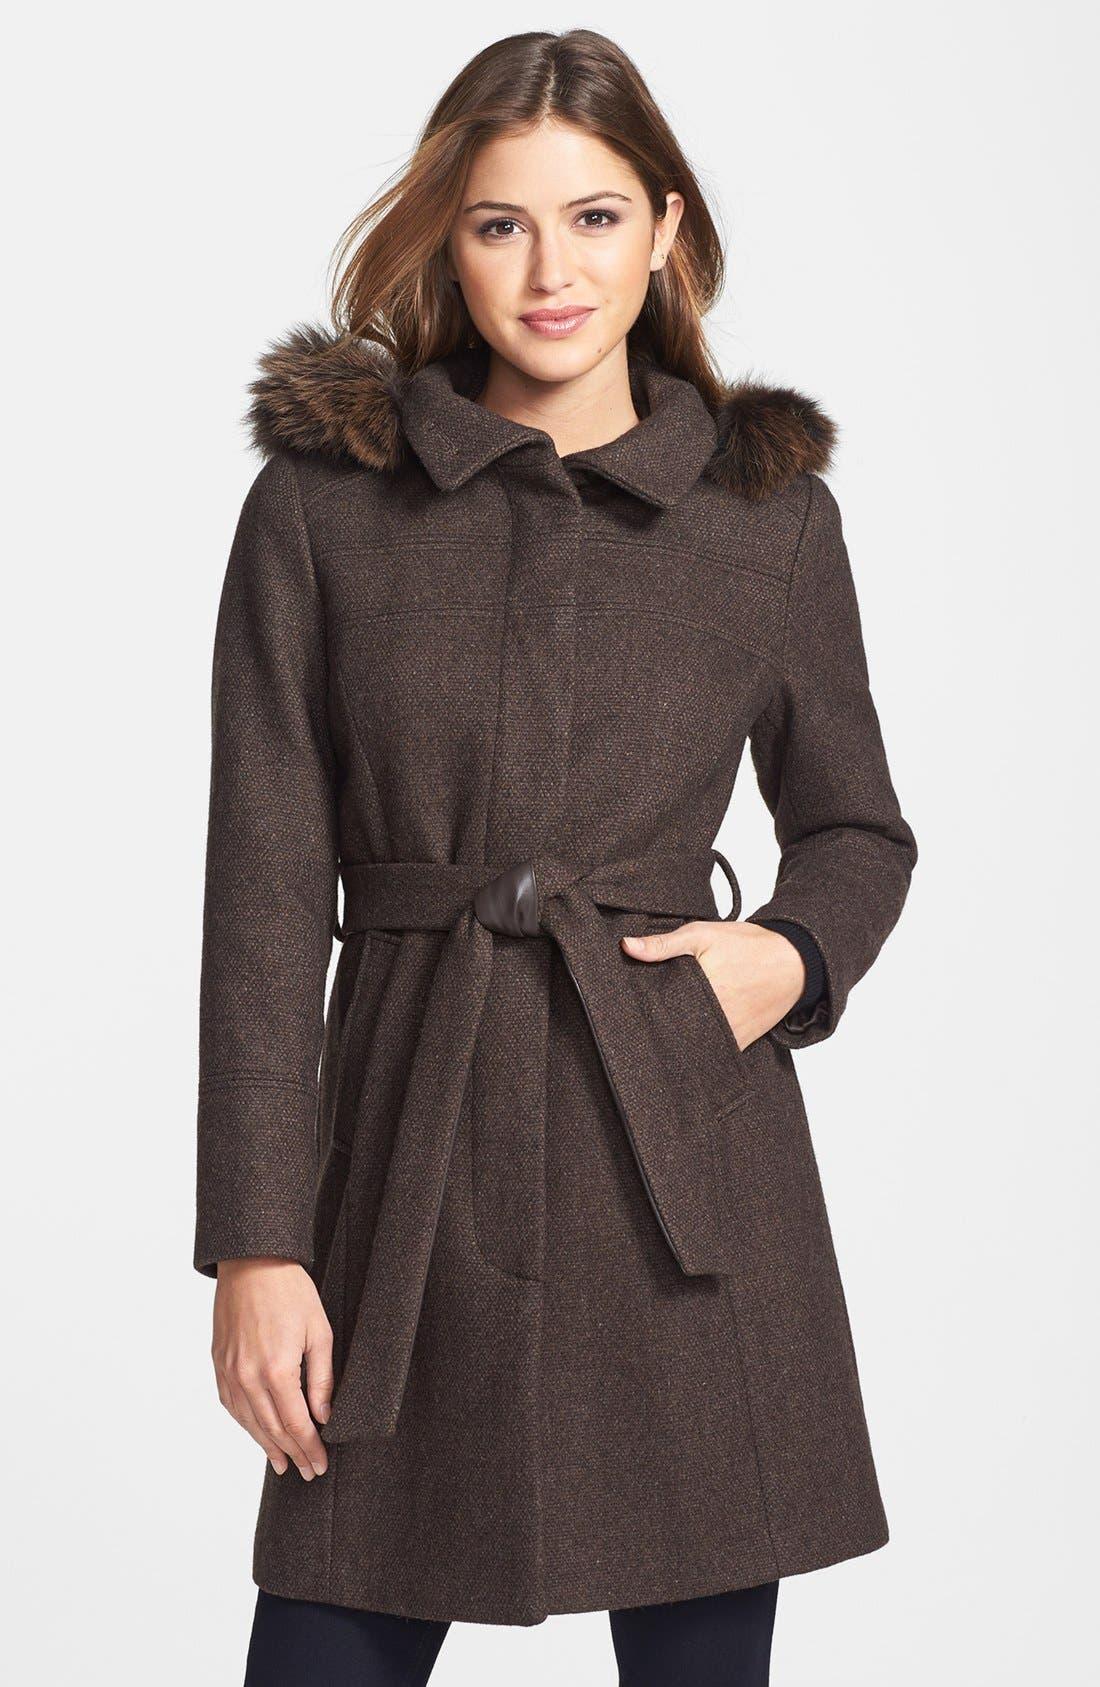 Alternate Image 1 Selected - Ellen Tracy Genuine Fox Fur Trim Hooded Coat (Petite) (Online Only)